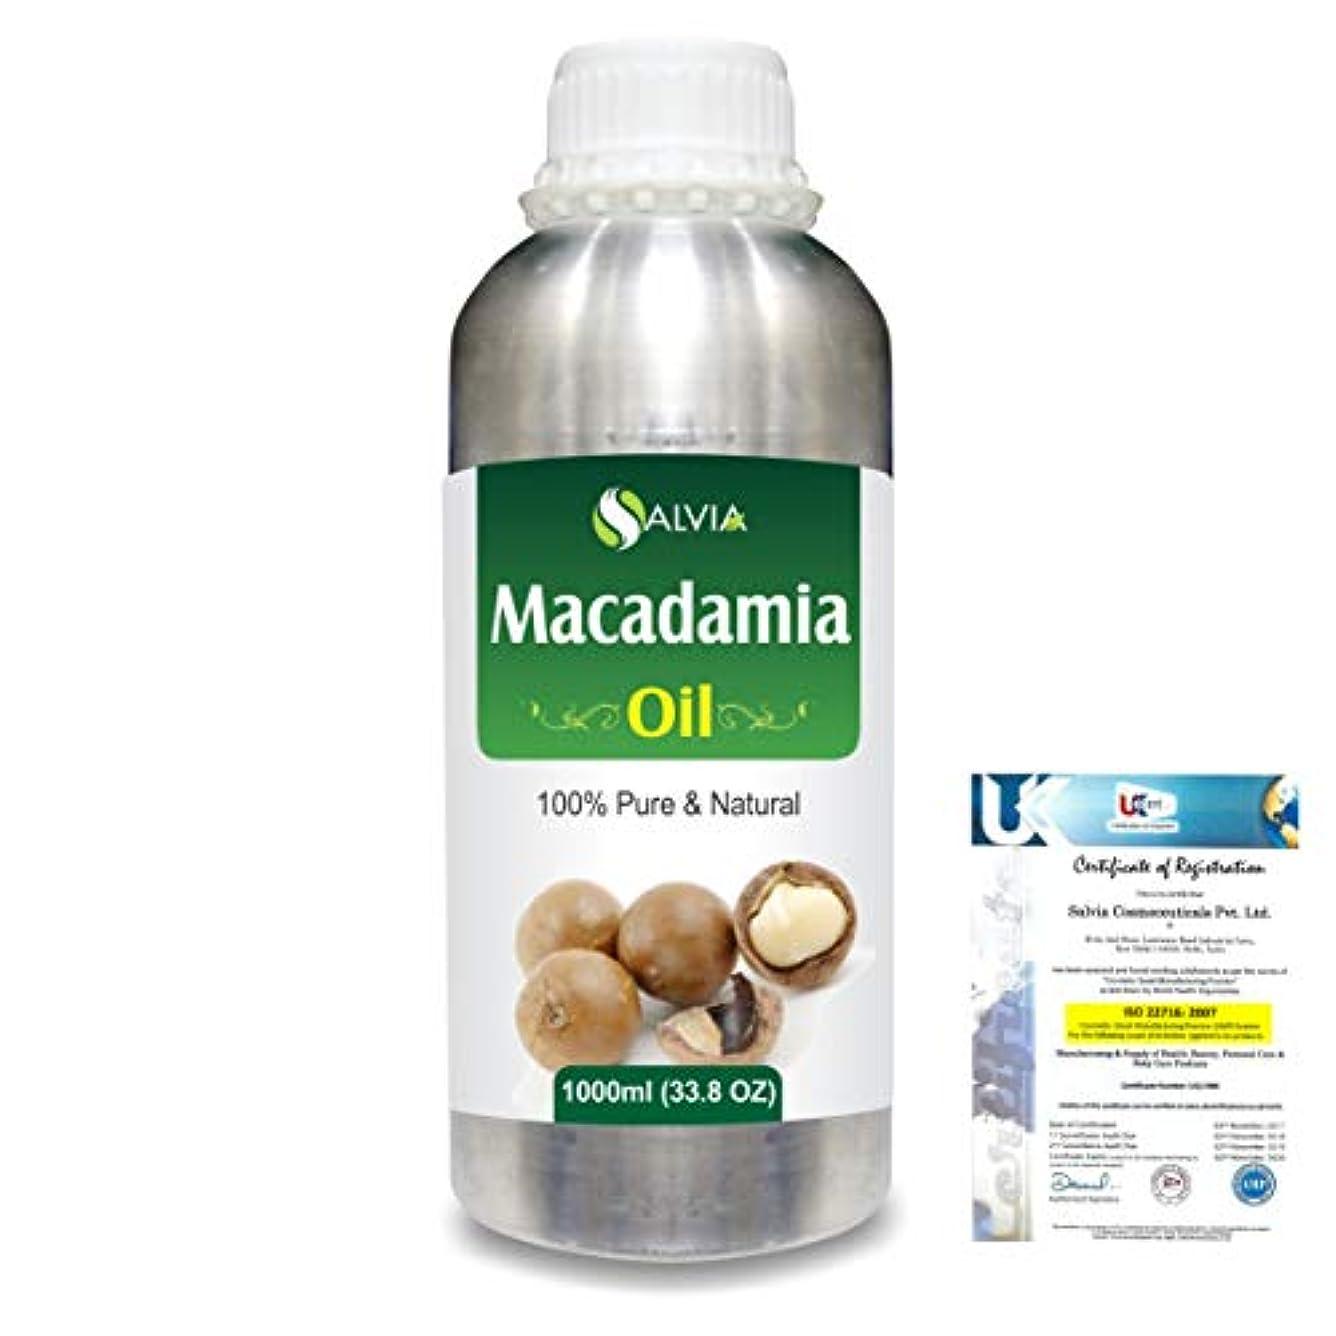 Macadamia (Macadamia Integrifolia) Natural Pure Undiluted Uncut Carrier Oil 1000ml/33.8 fl.oz.